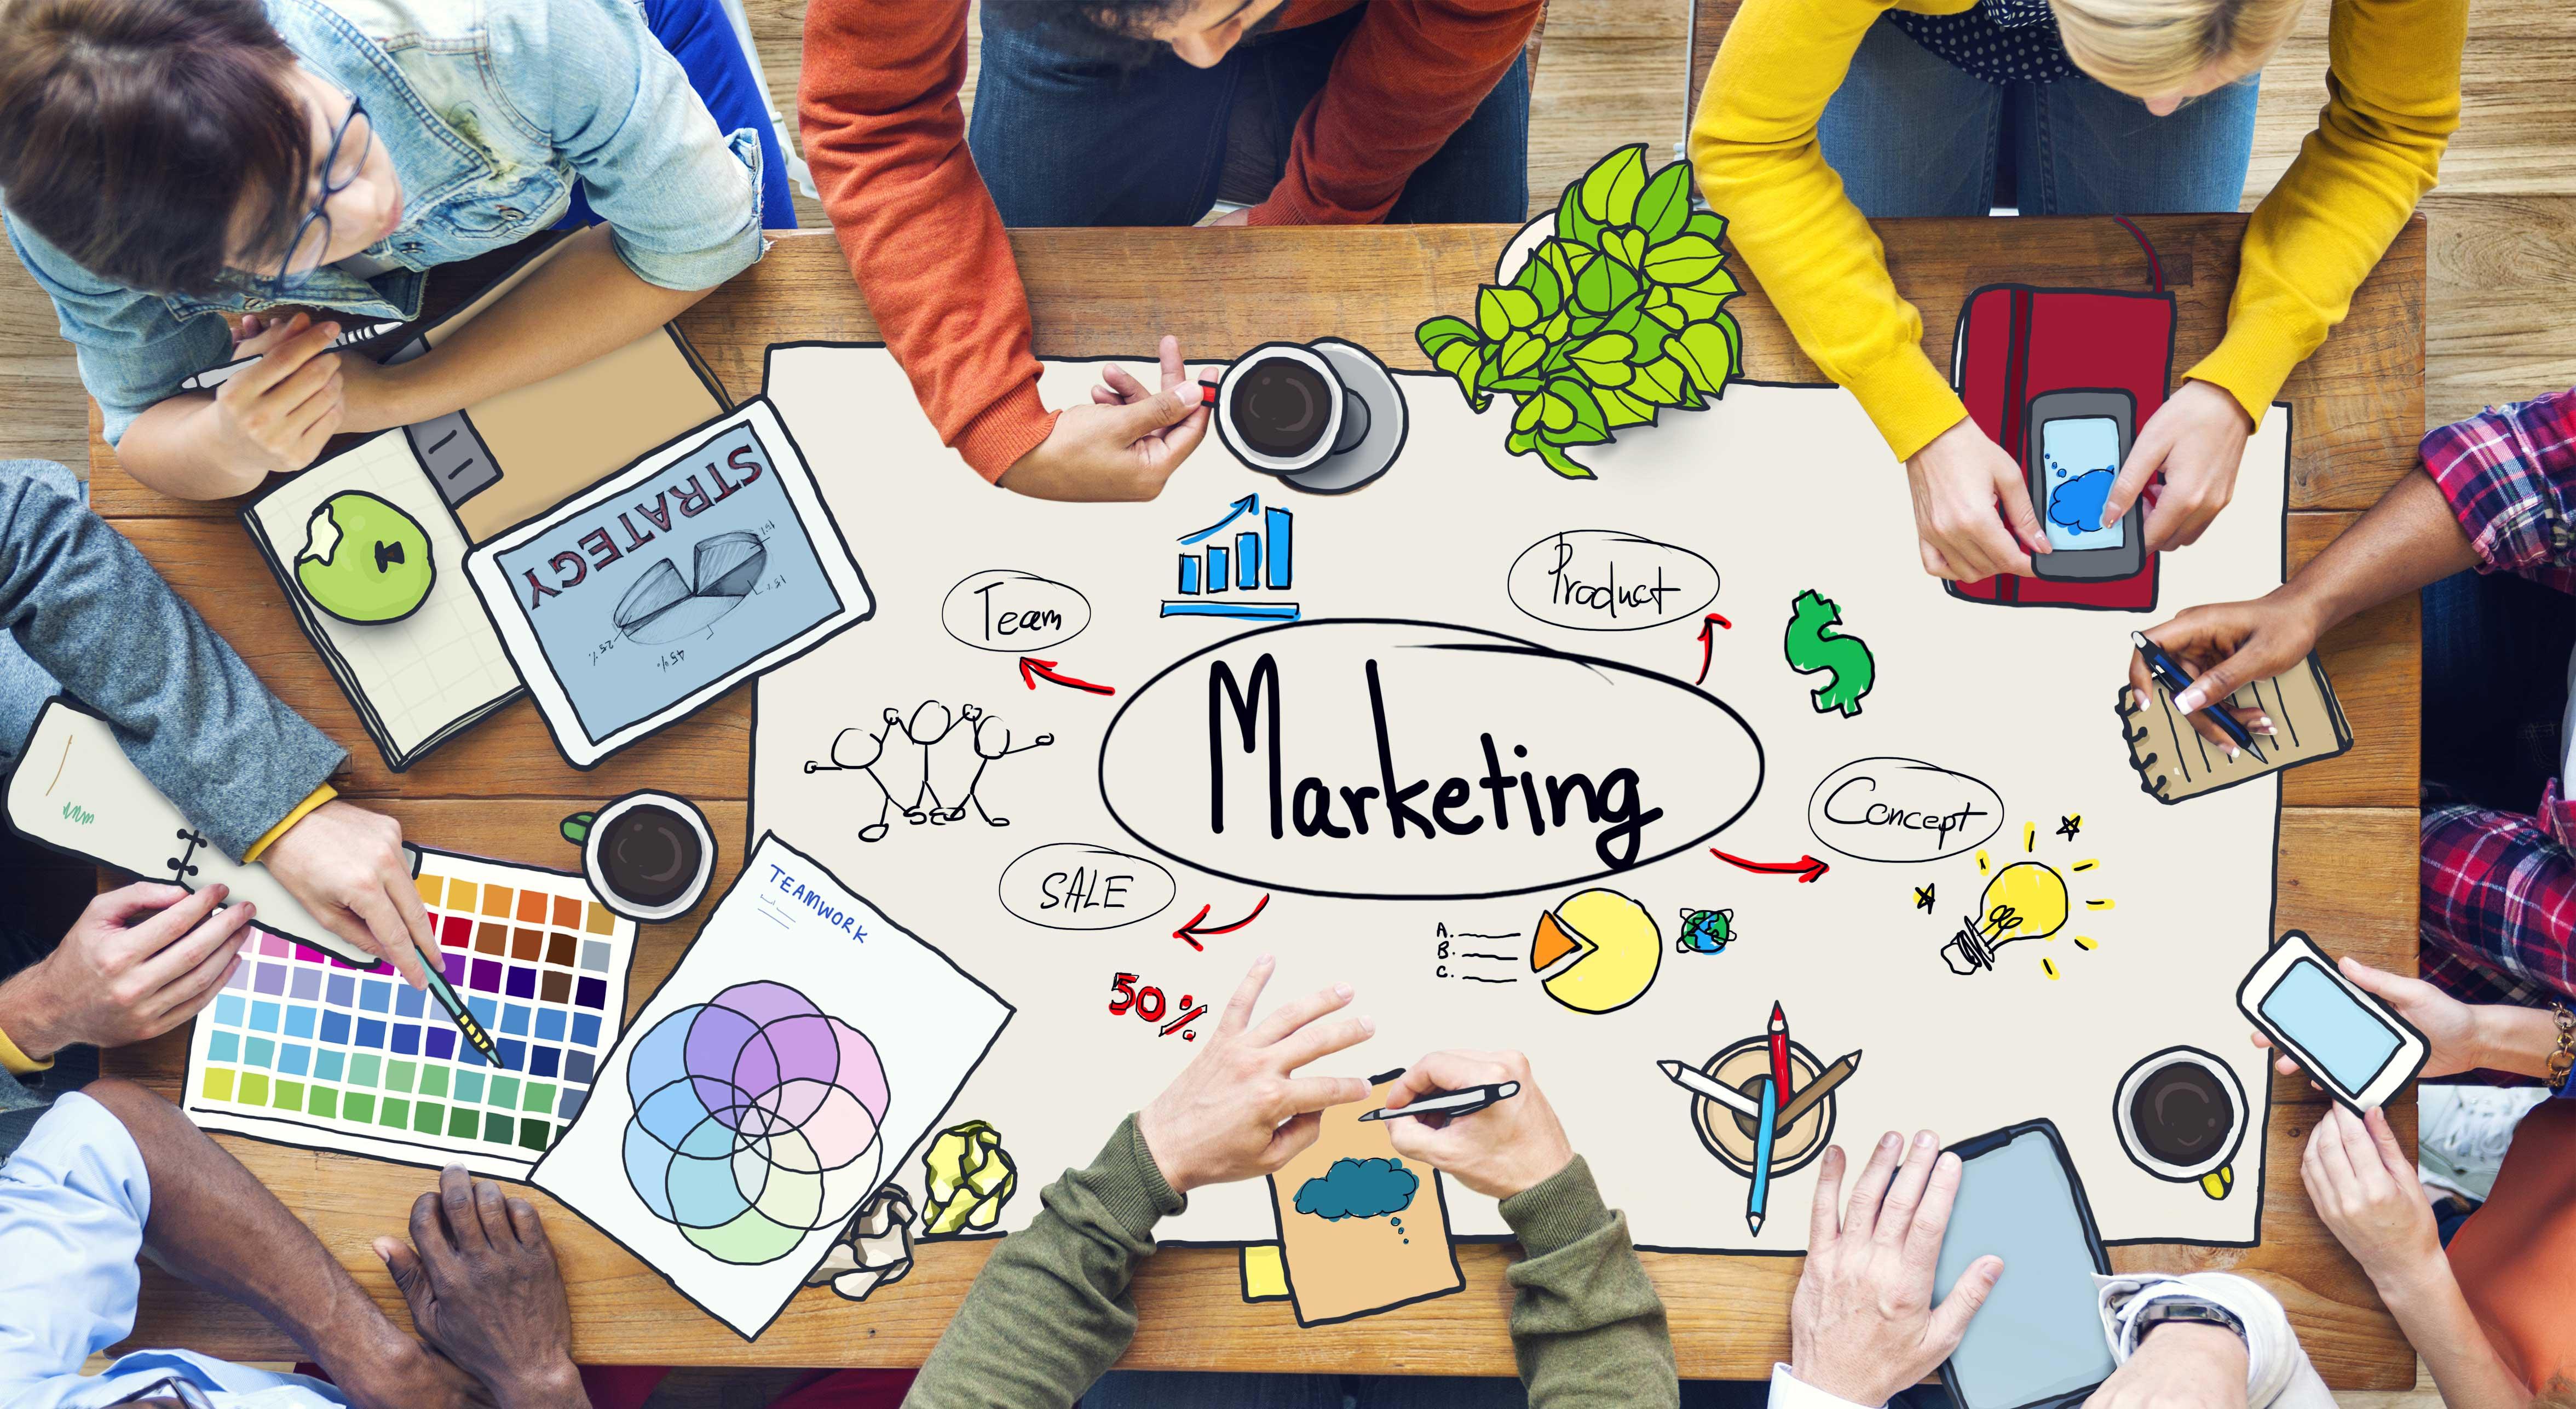 Marketing-linh-vuc-chiem-49%-ban-tin-tuyen-dung-Viet-Nam